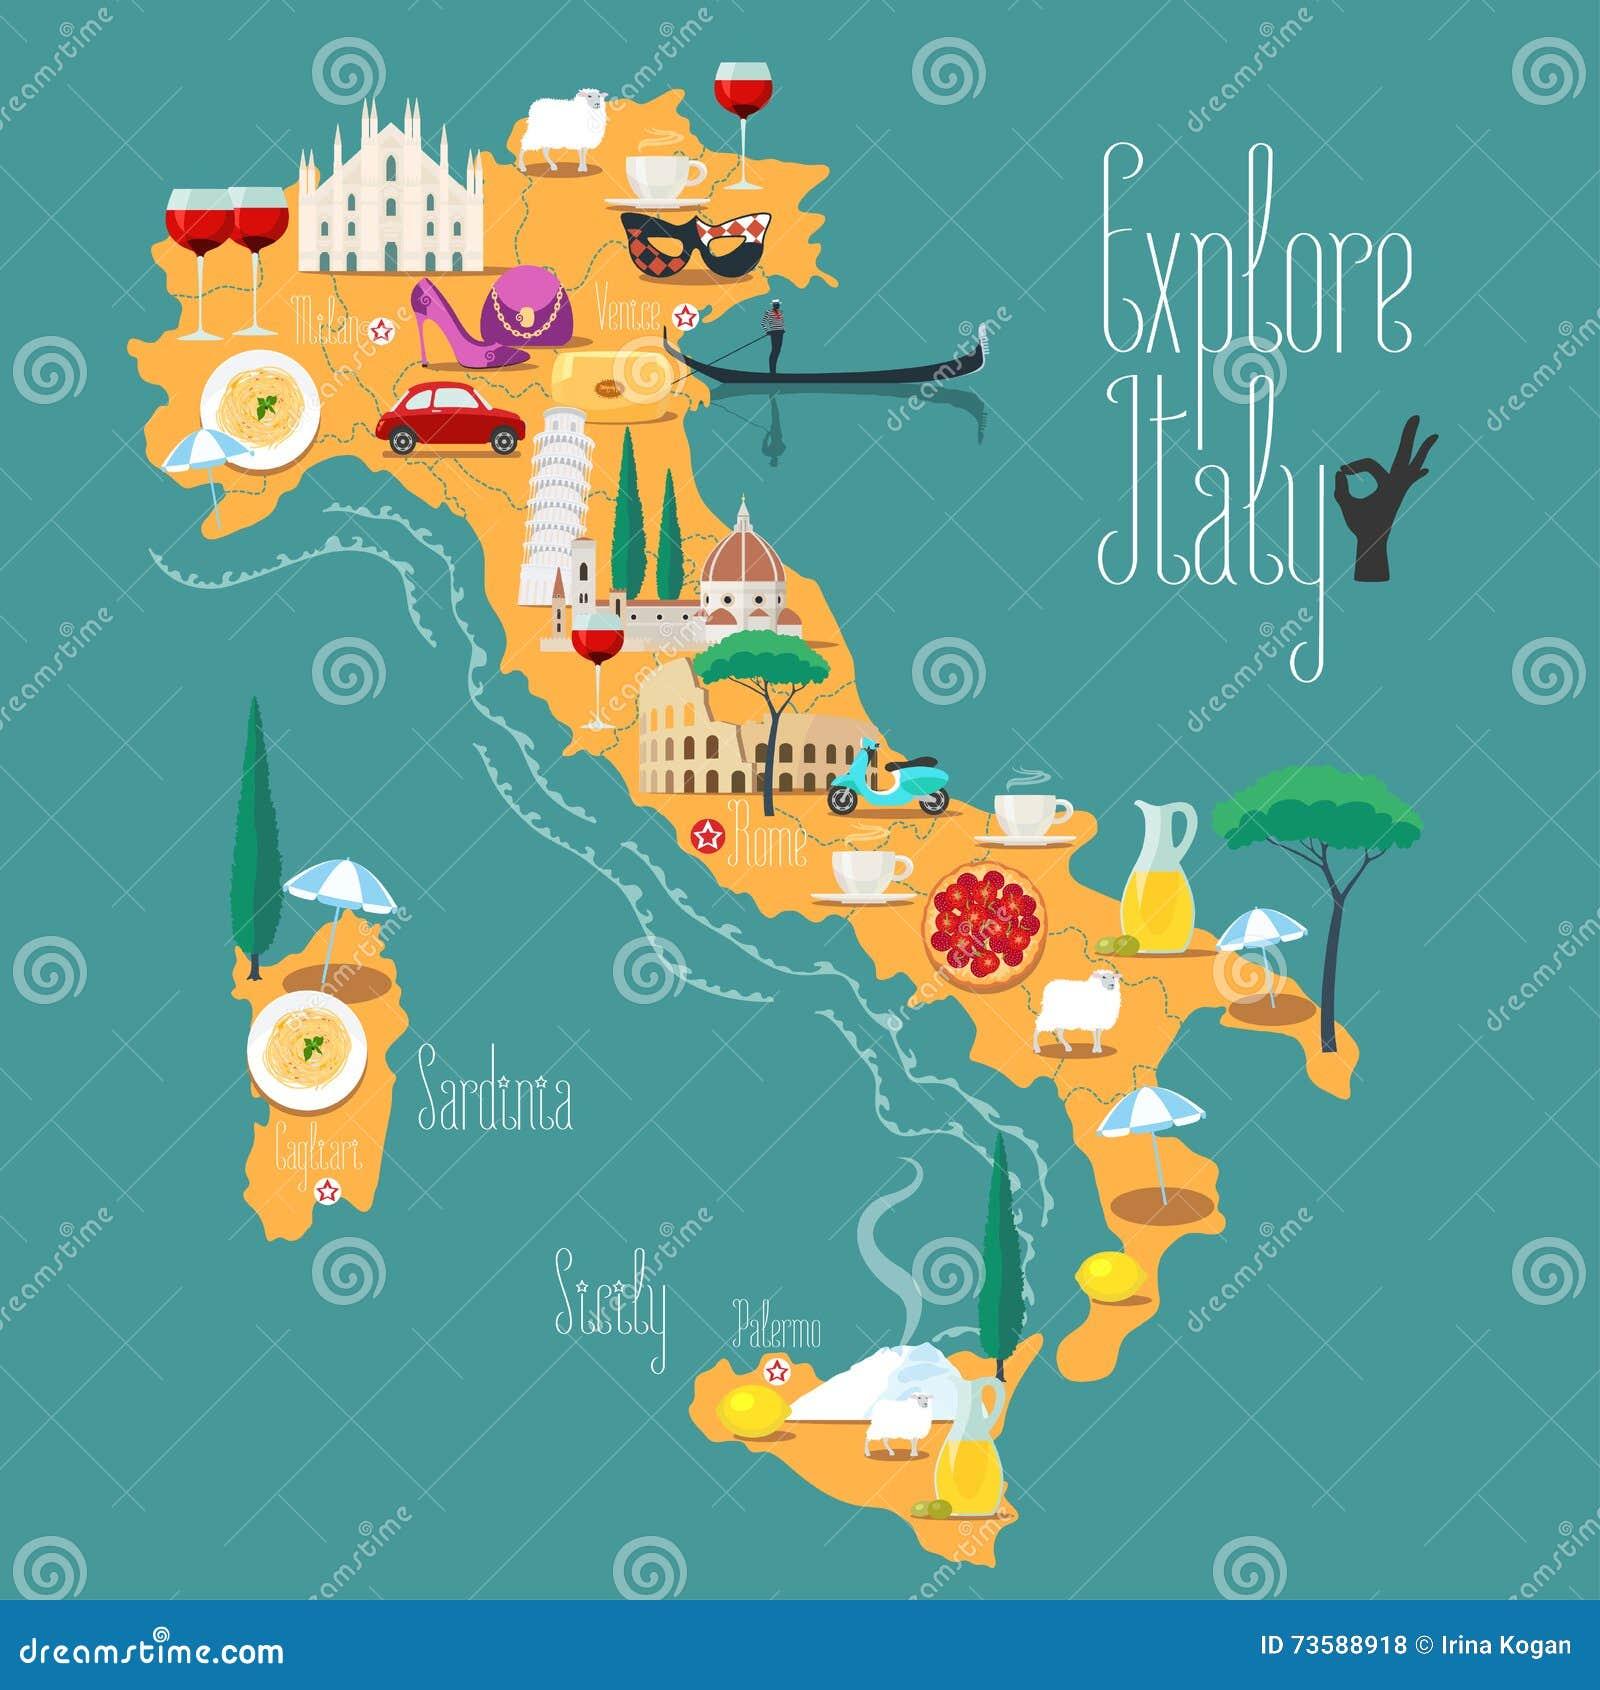 Cartoon Map Of Italy Stock Vector Image Of Italian Food - Map of italy